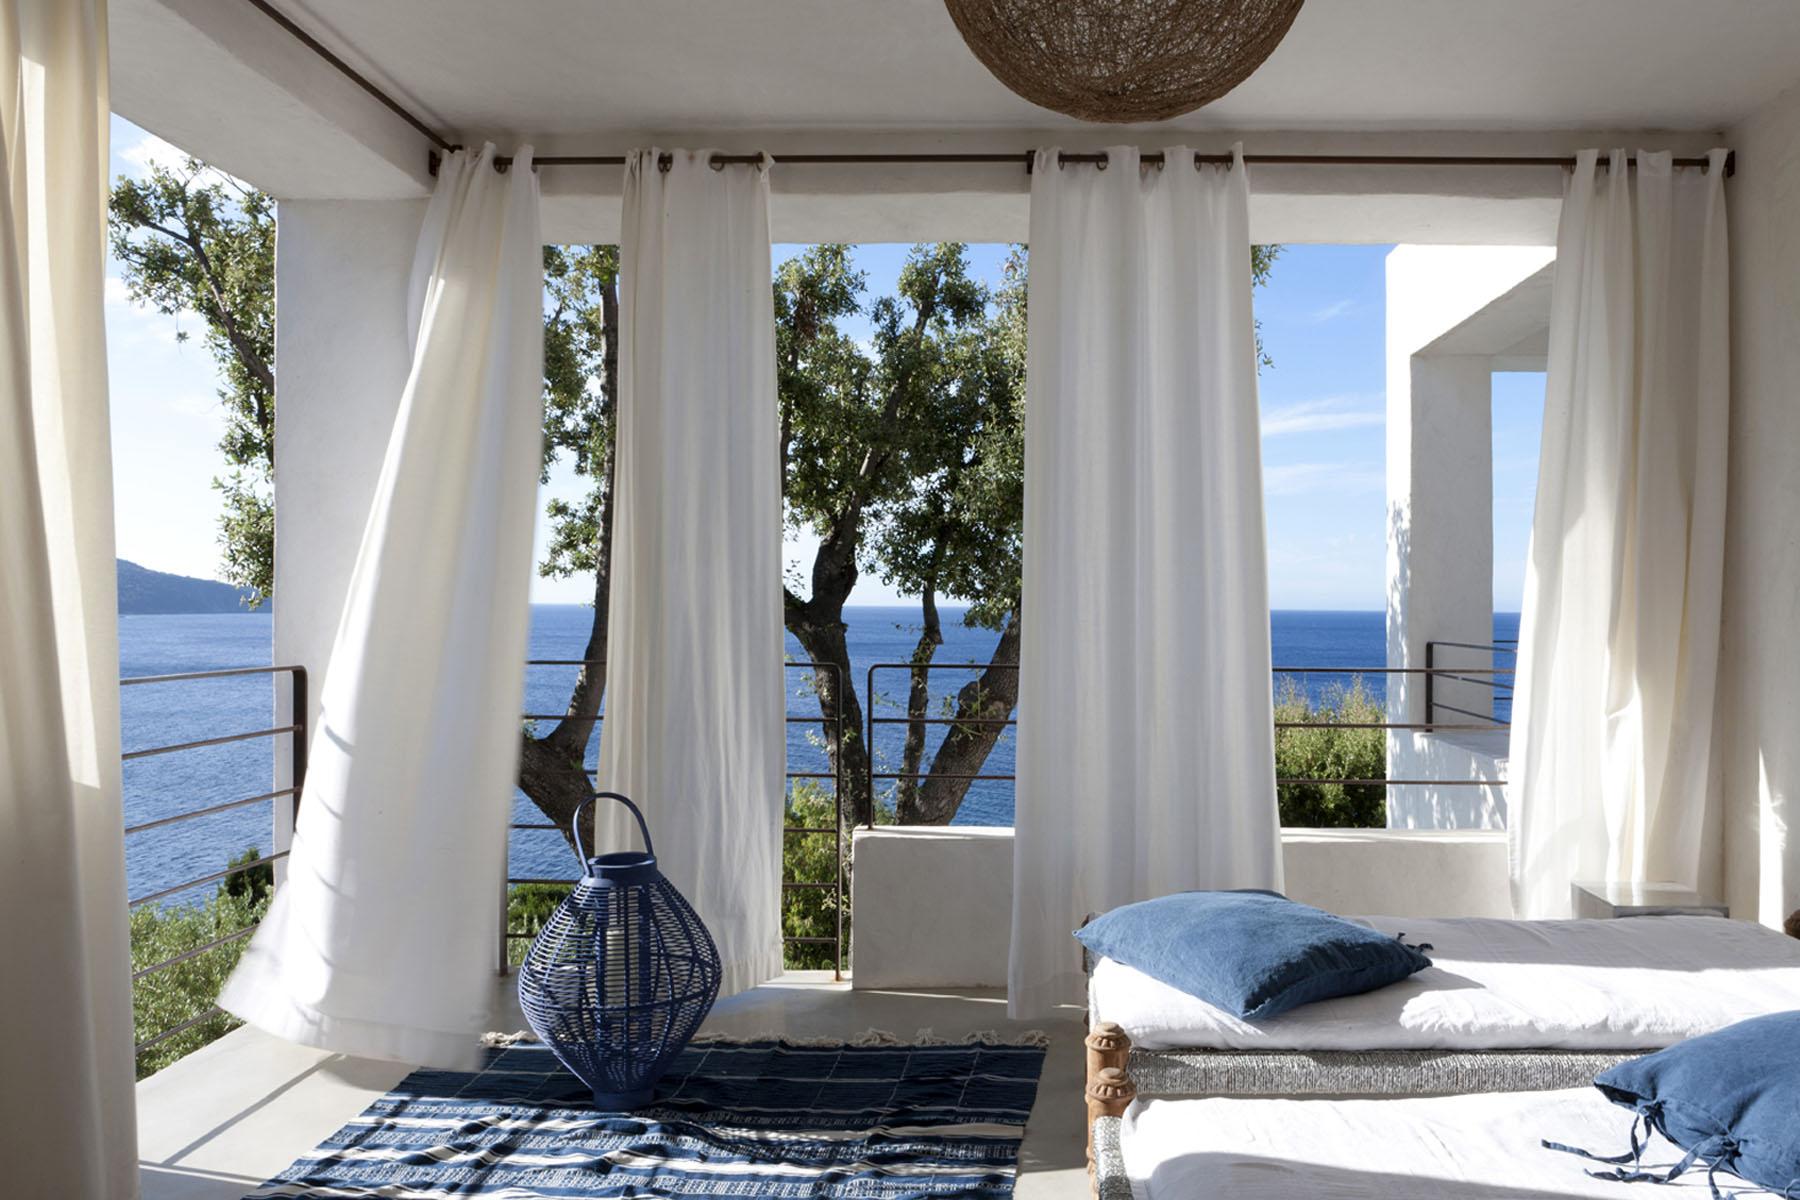 2-Florence_Watine_Architecte_Designer_Decoratrice_Decoration_Paris_France_St_Tropez_Maison_Villa_Mediterranee_Design